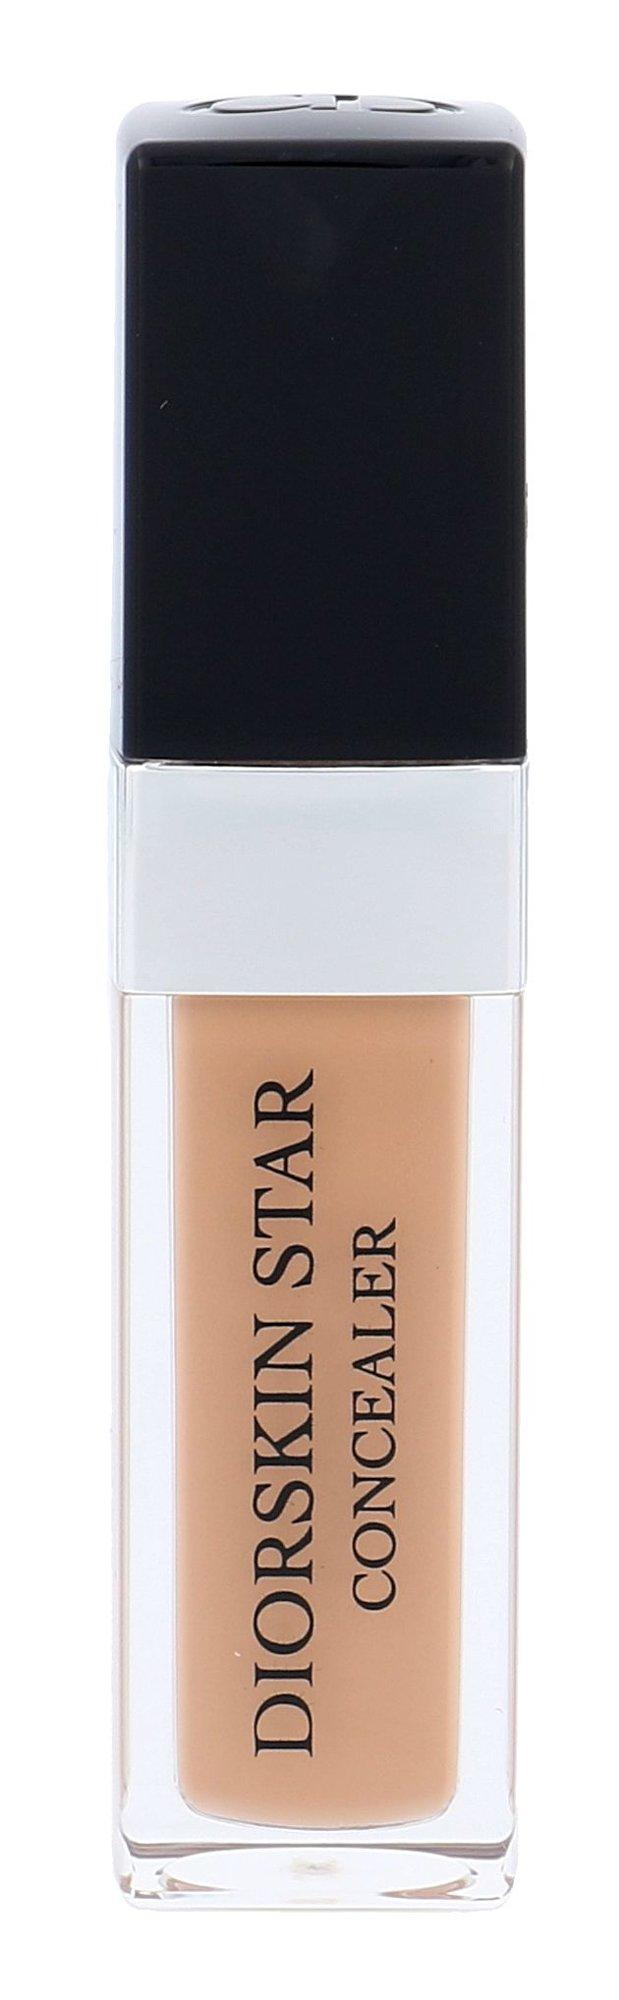 Christian Dior Diorskin Star Cosmetic 6ml 003 Sand